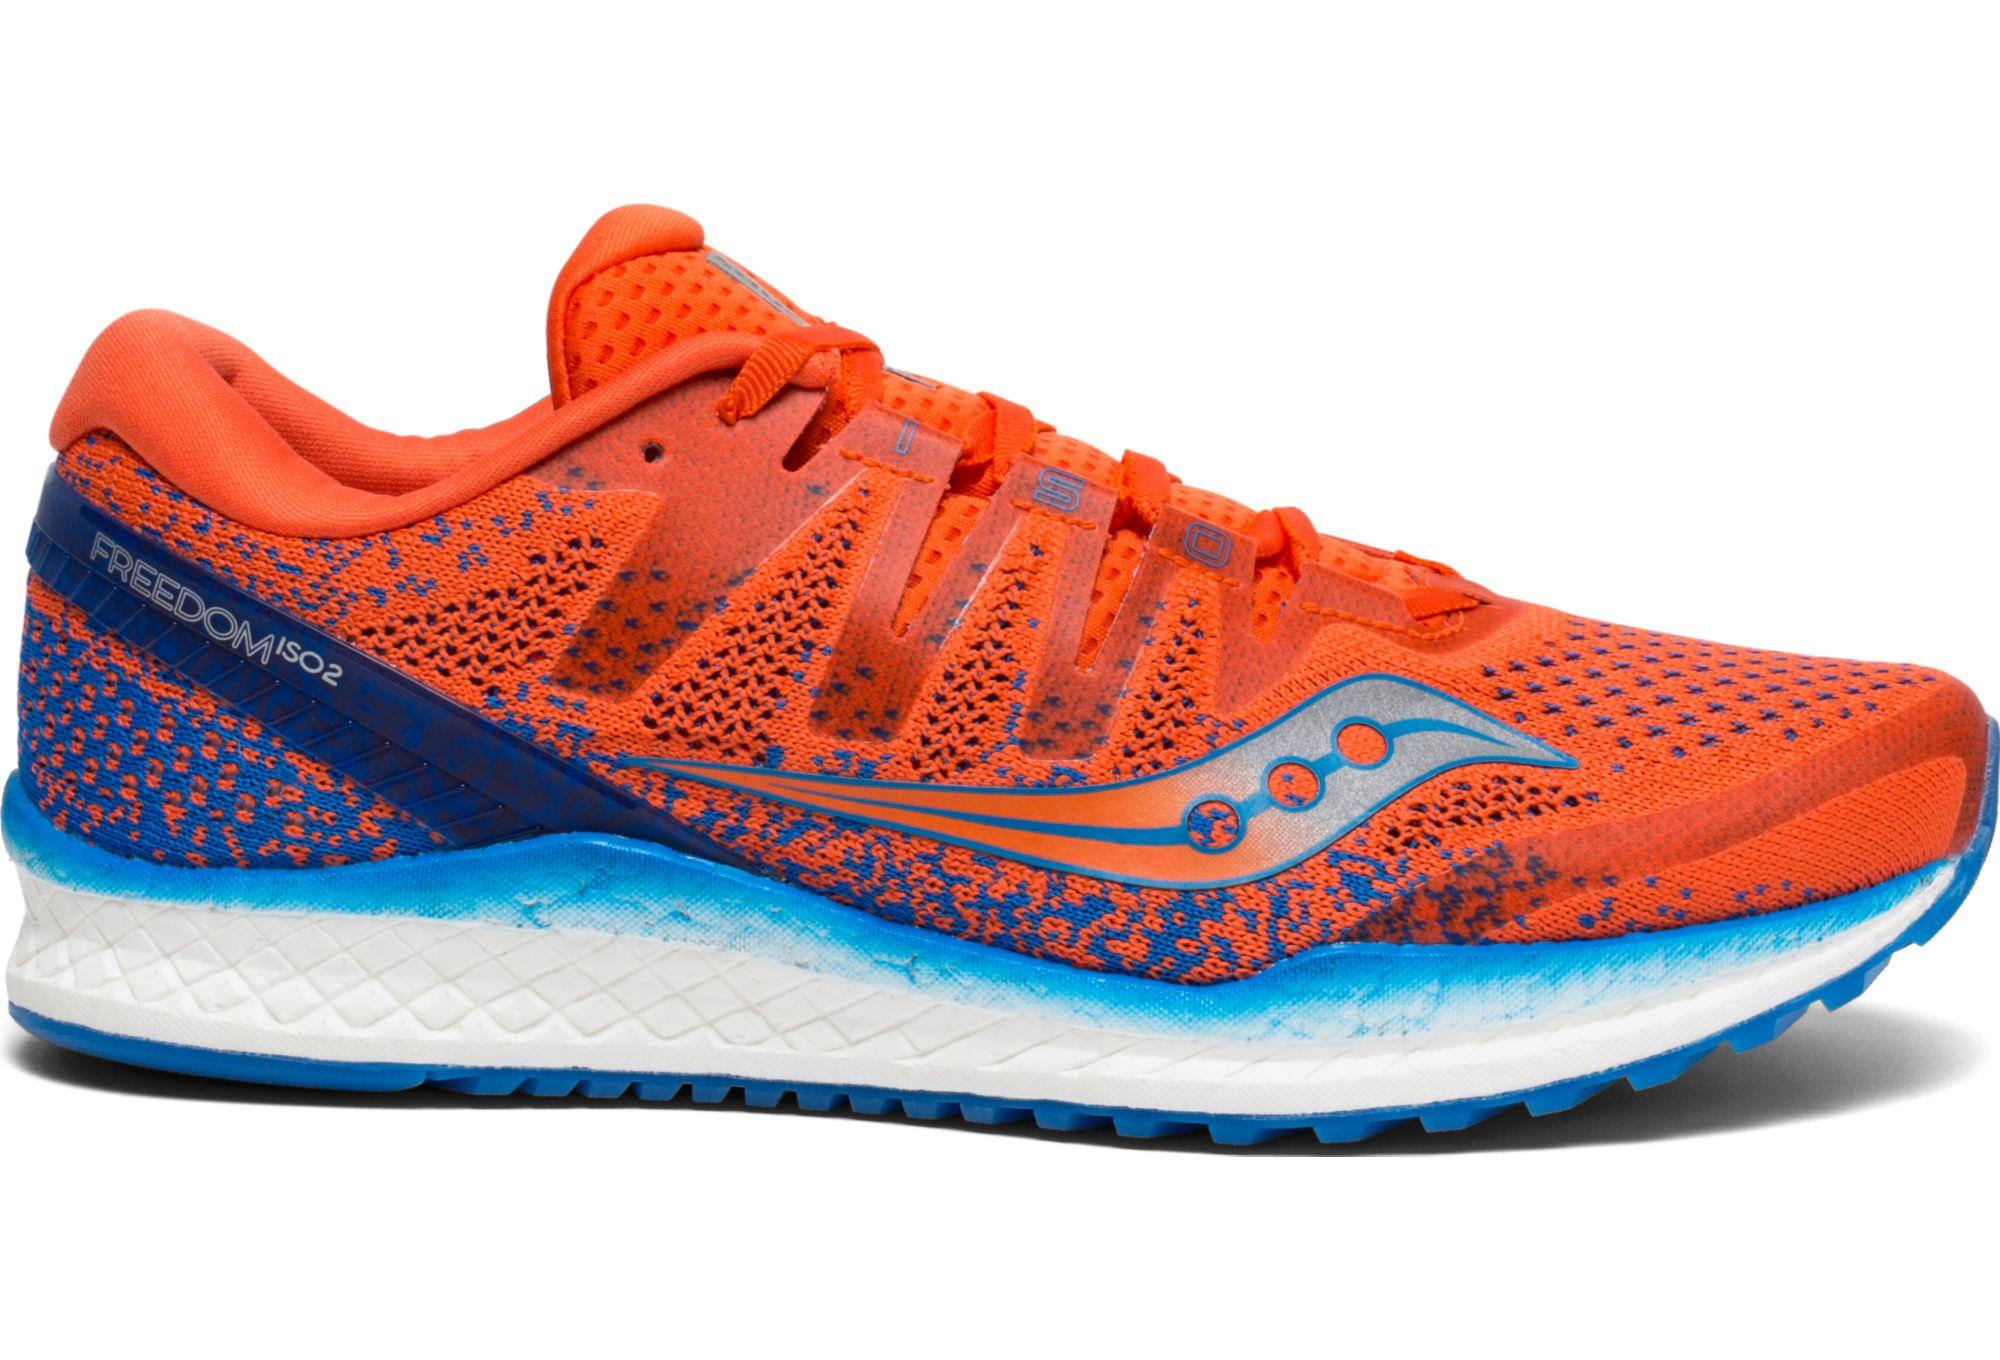 Saucony Freedom ISO 2 Running Shoes Orange Blue